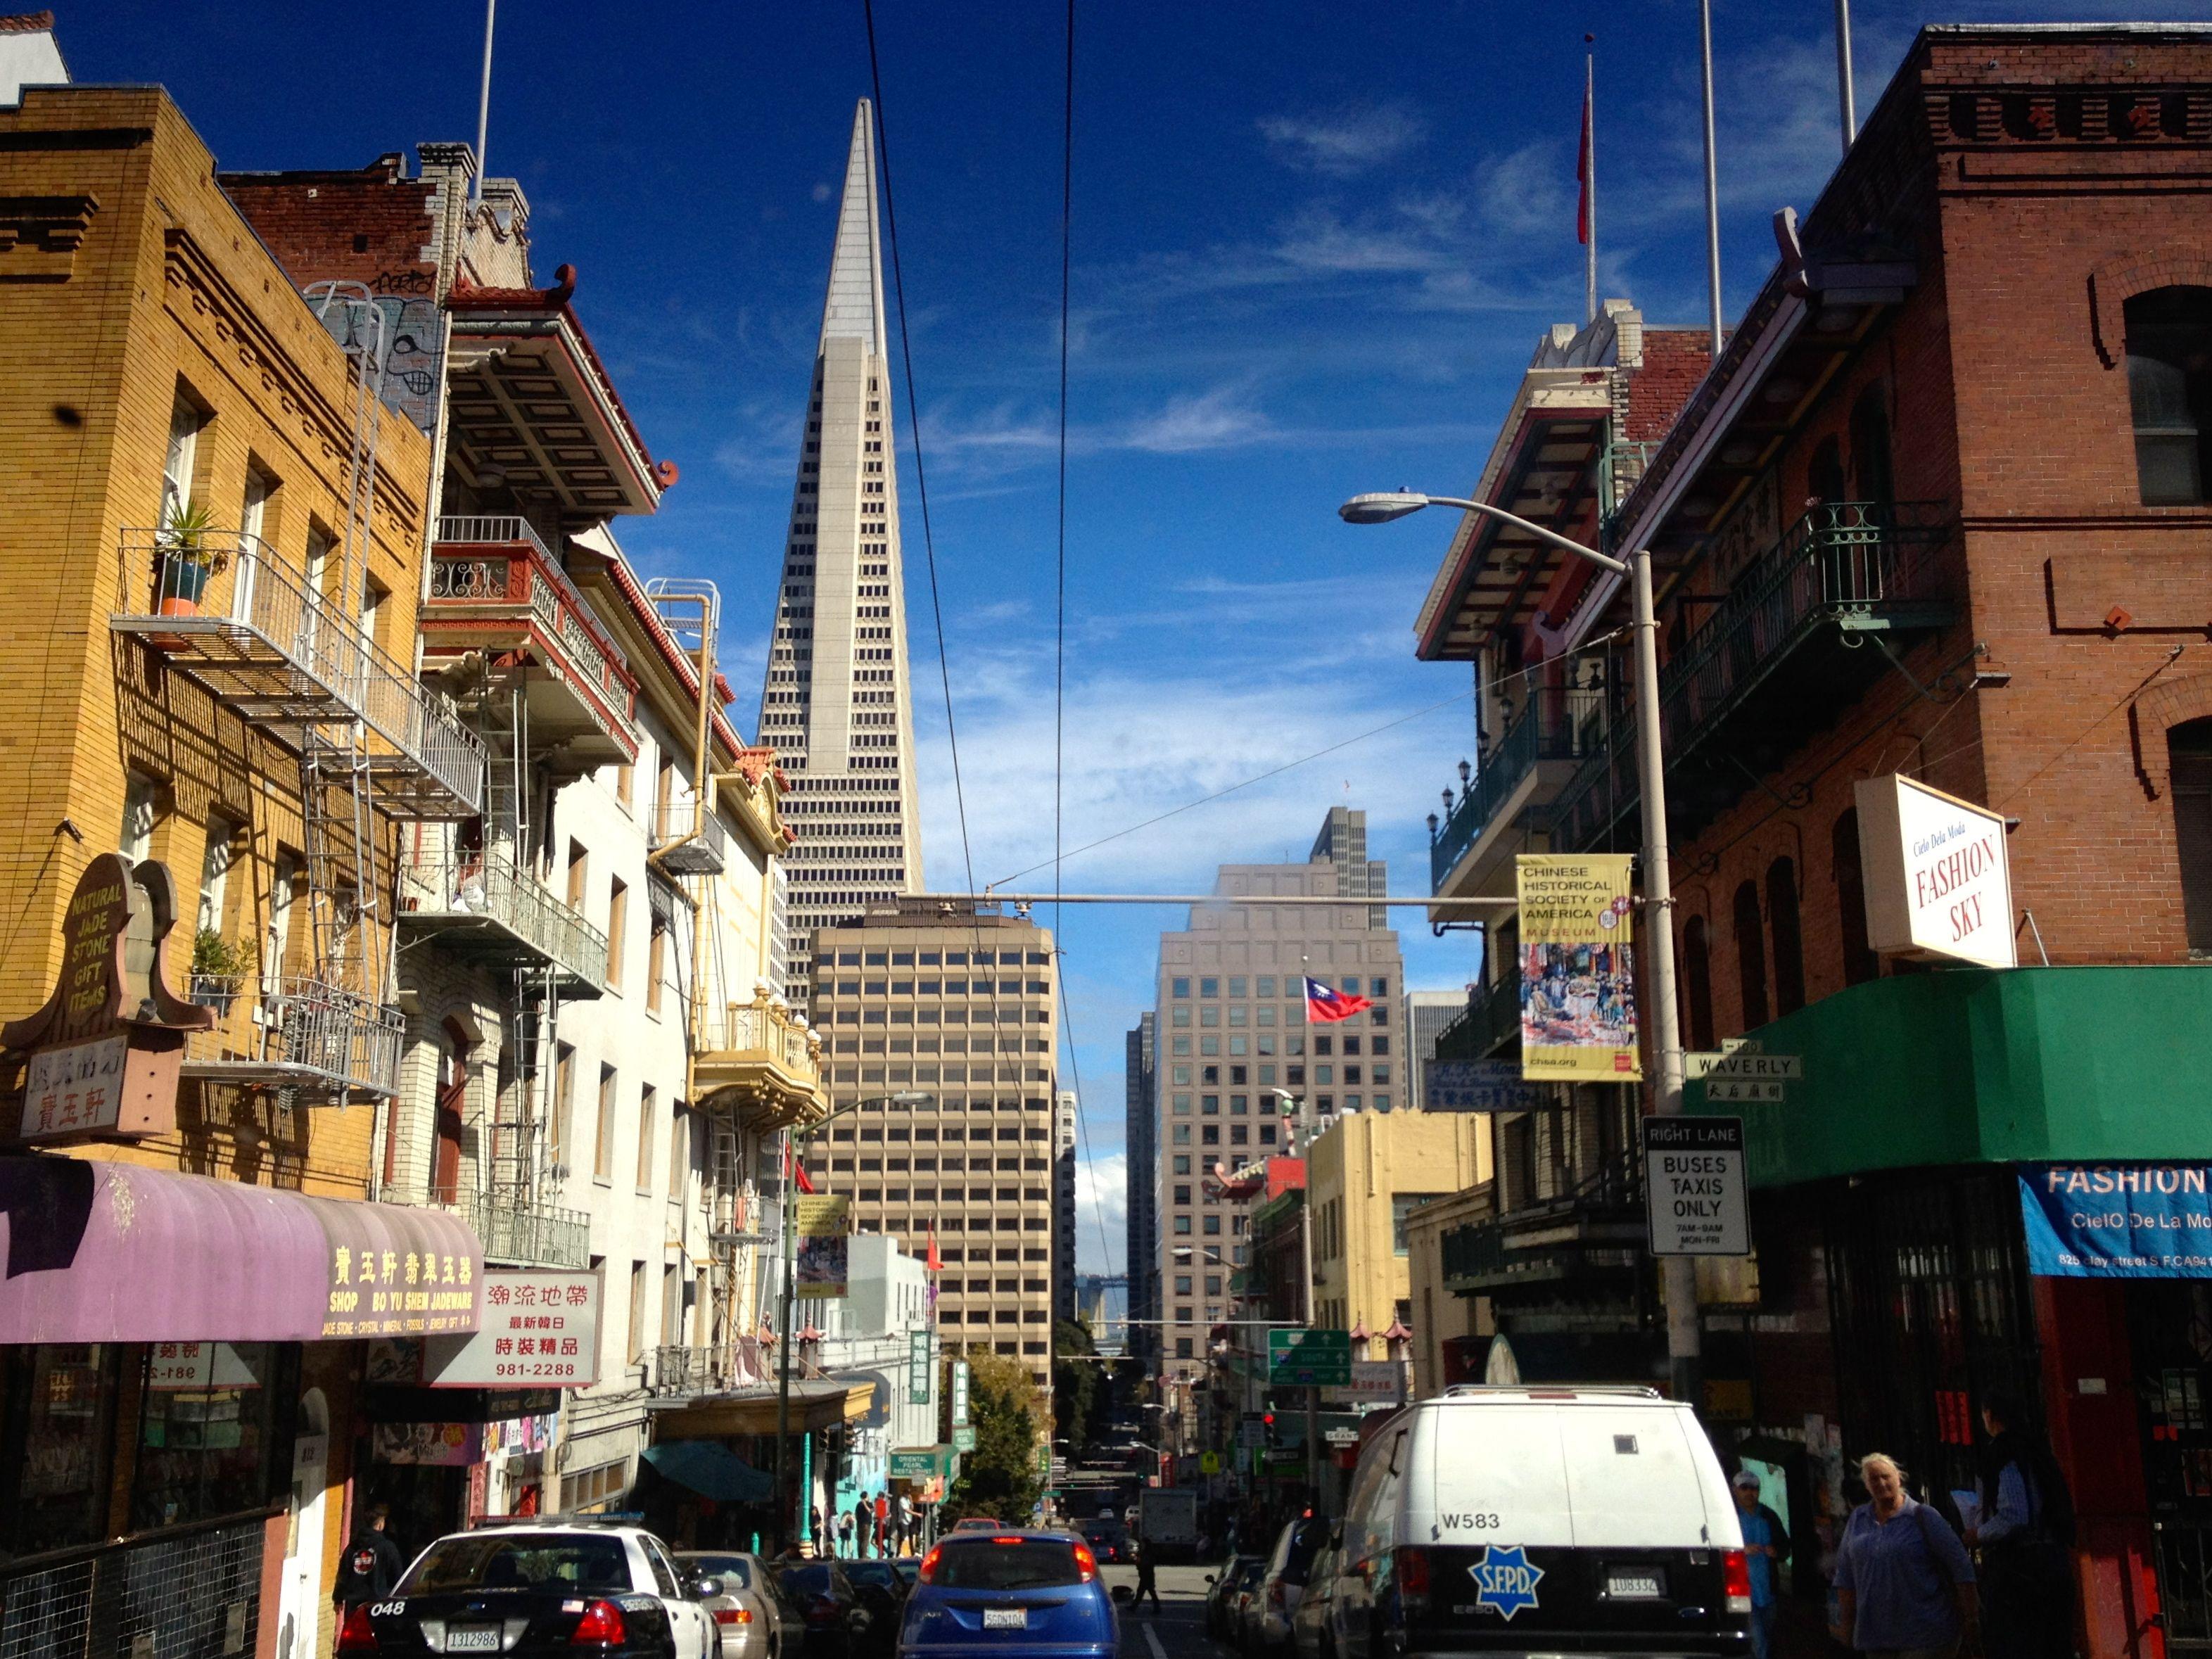 Busy street, beautiful day. I heart SF.